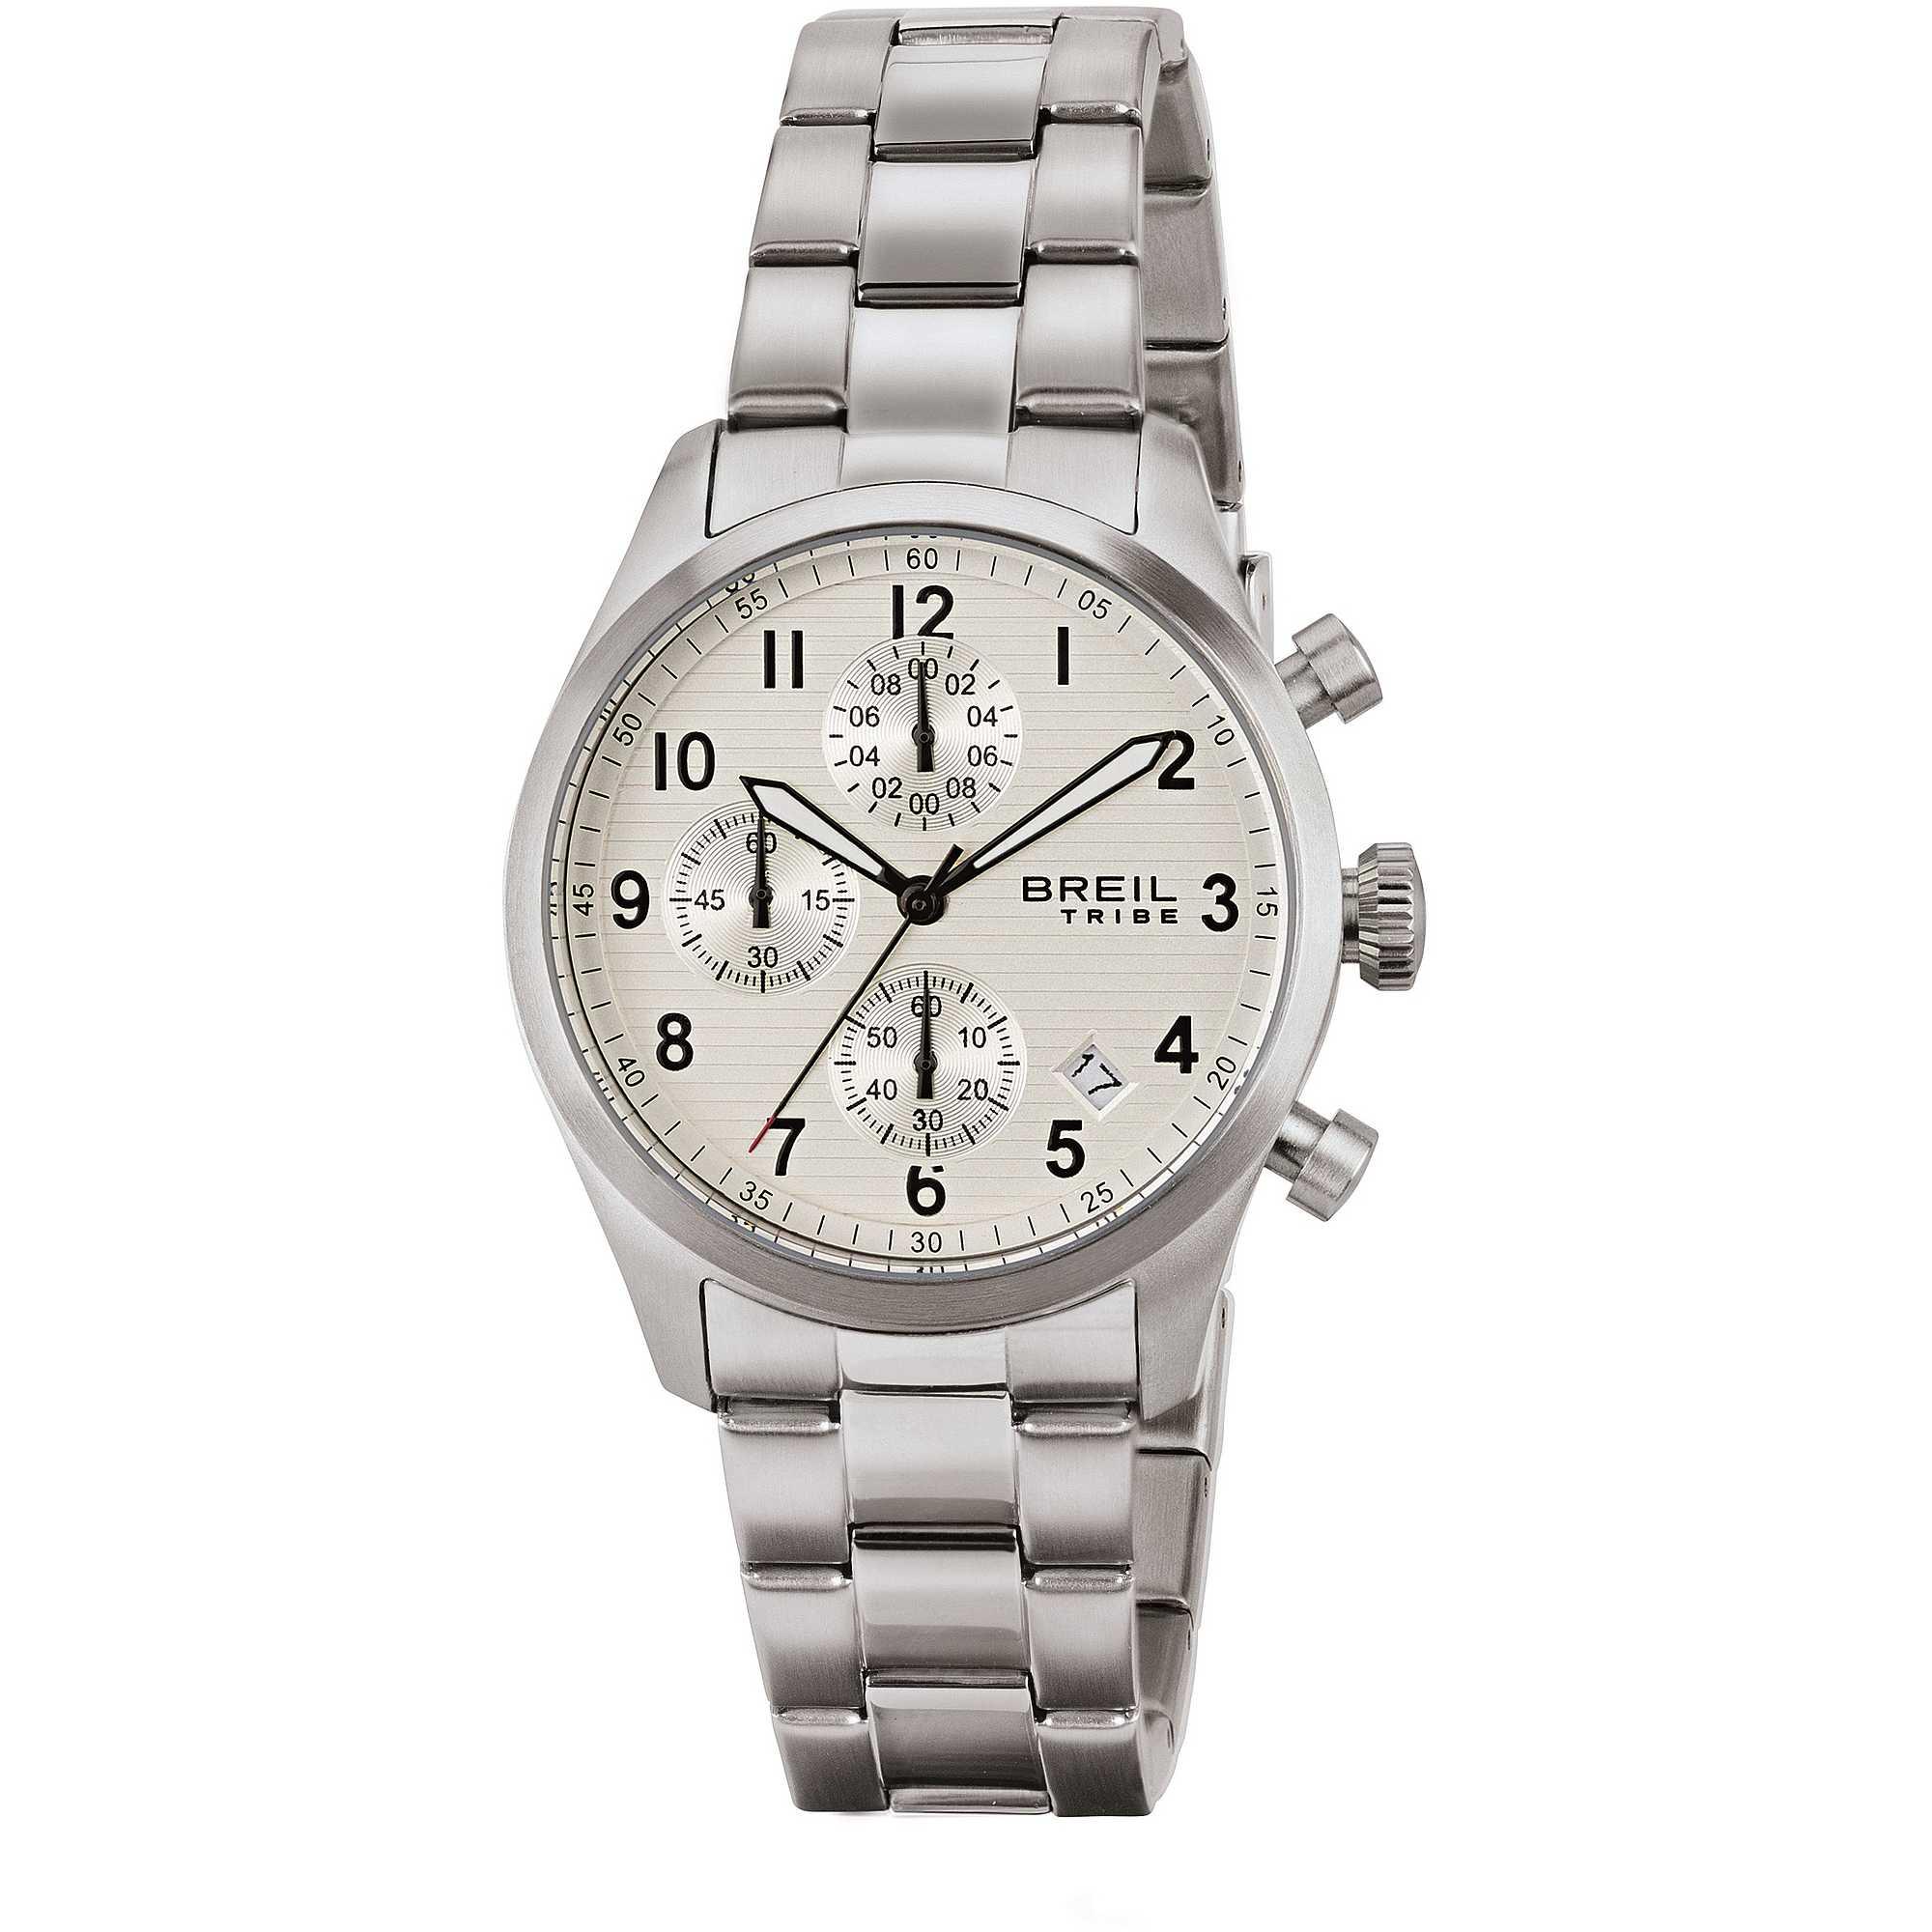 ebb3b2cb823 orologio cronografo donna Breil Sport Elegance EW0261. zoom. vendita ...